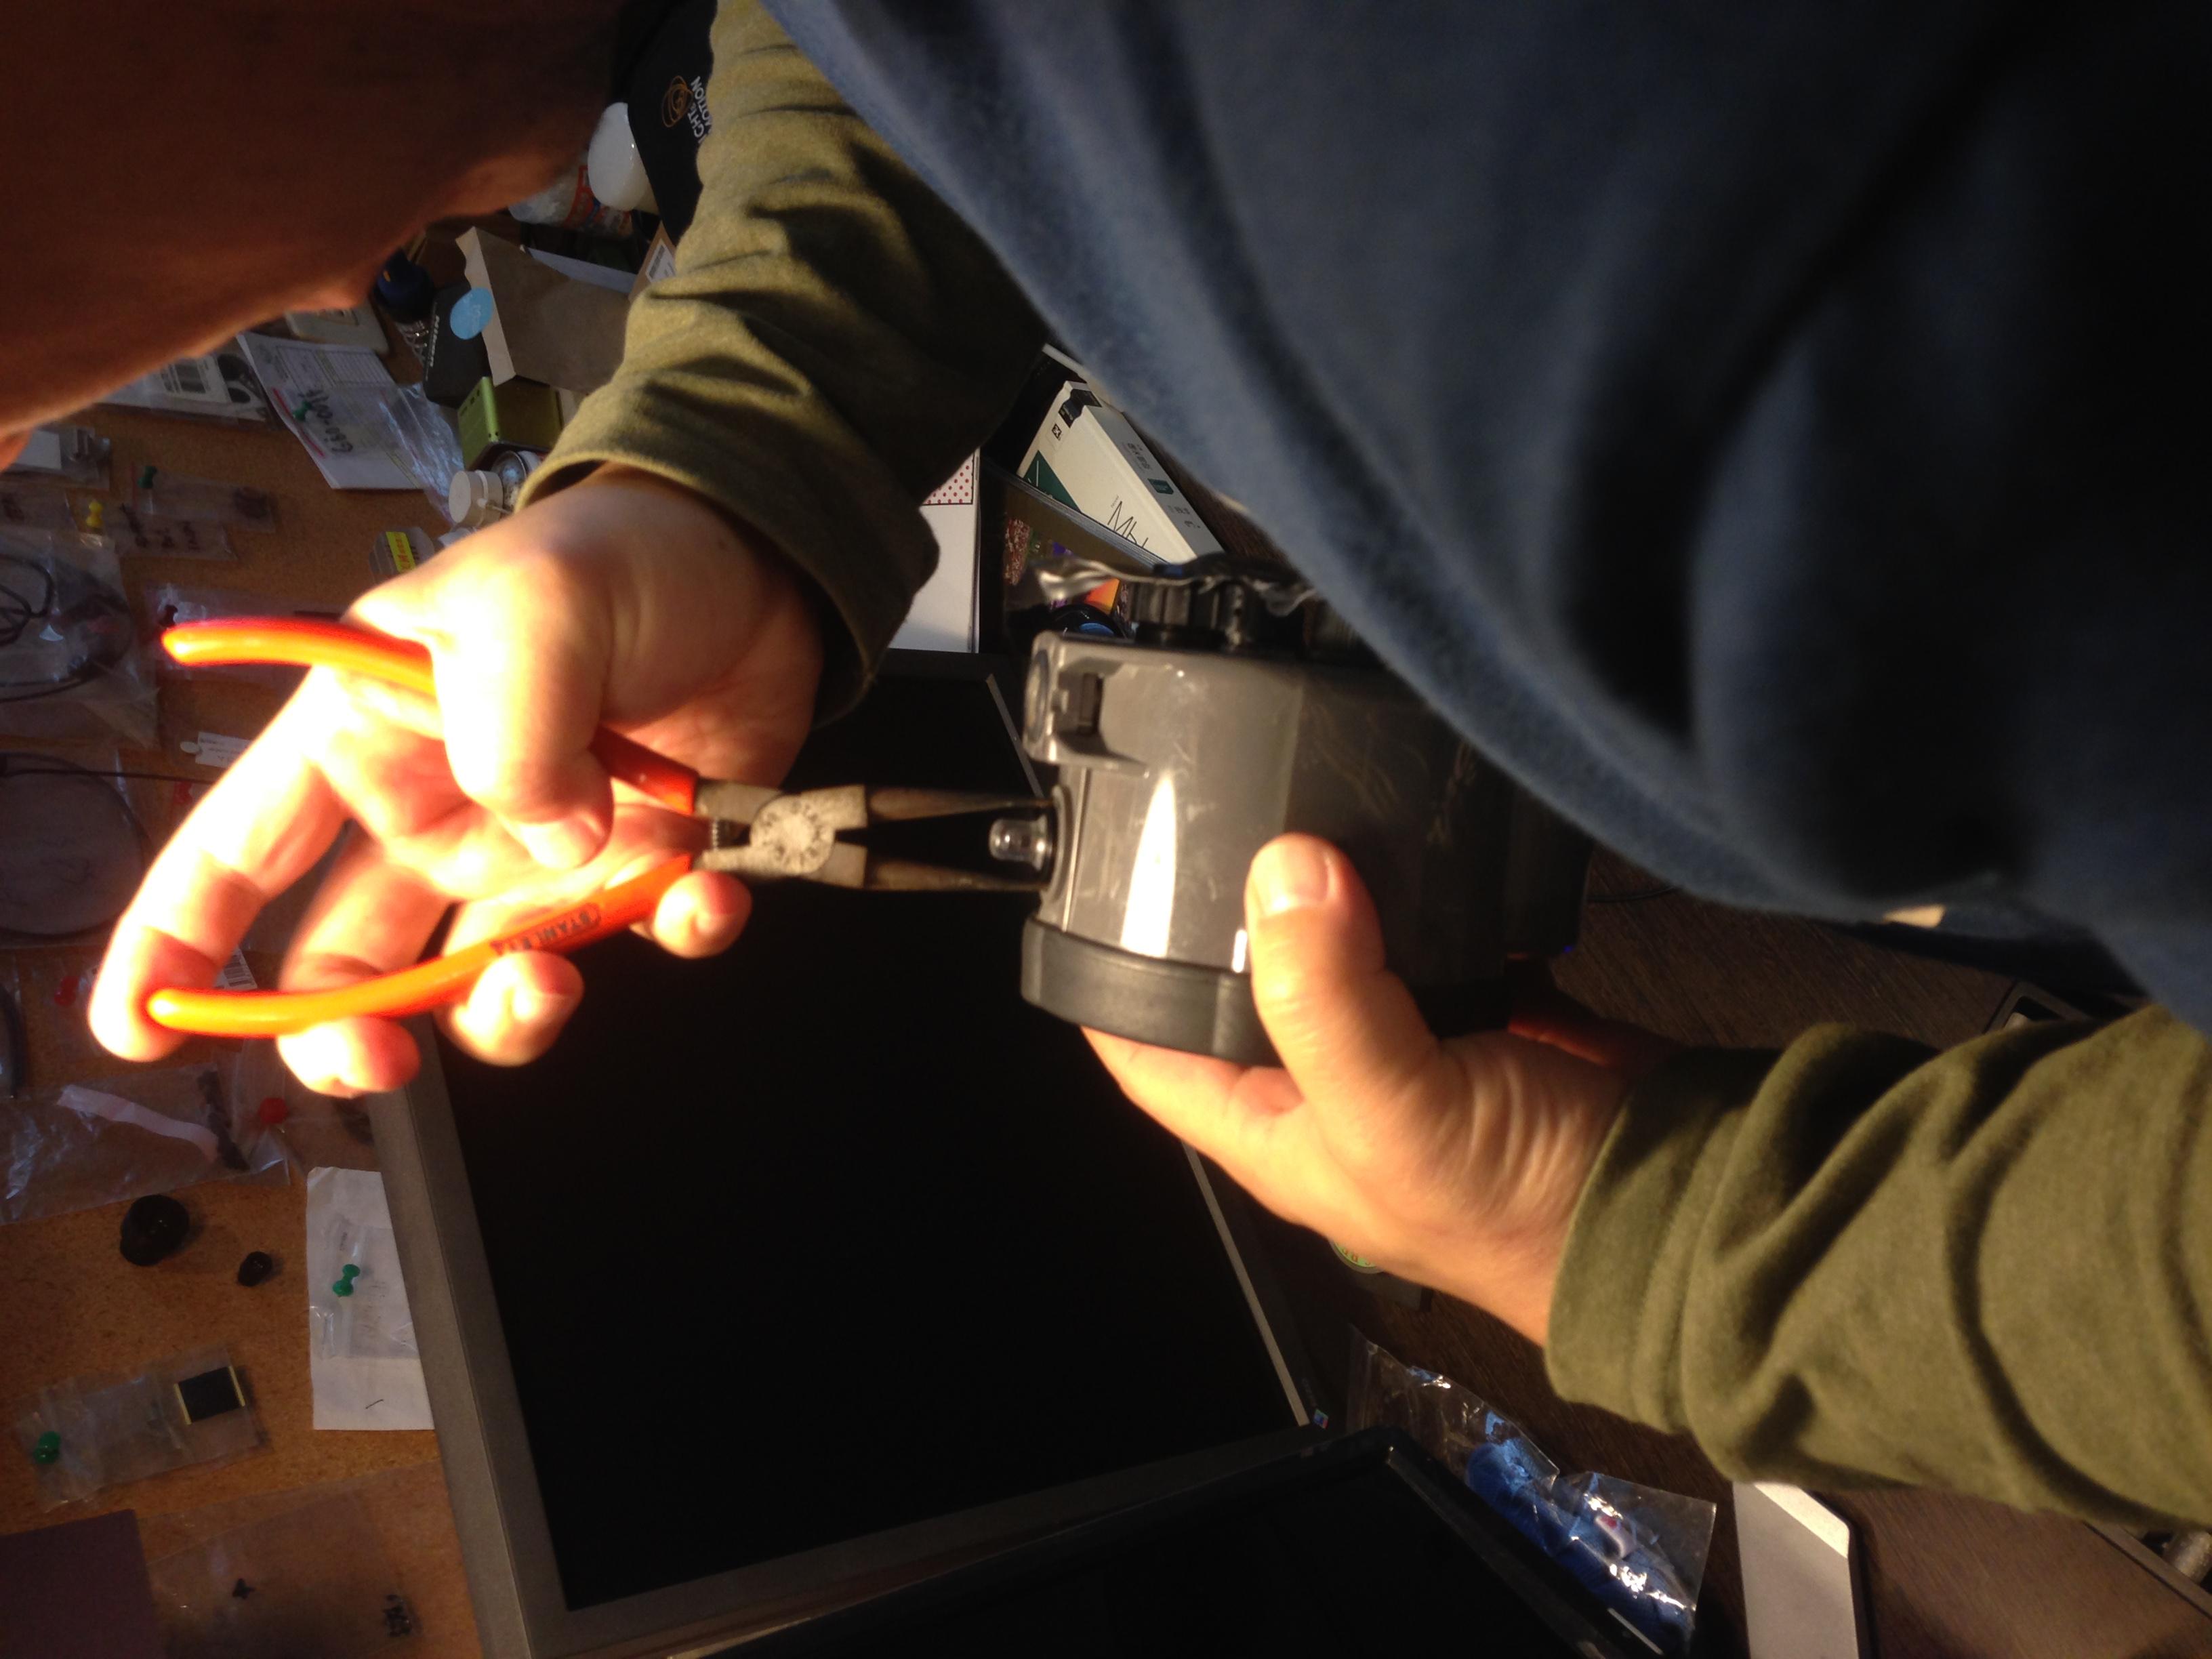 INON Z-240 光訊號觸發感應器蓋子斷裂